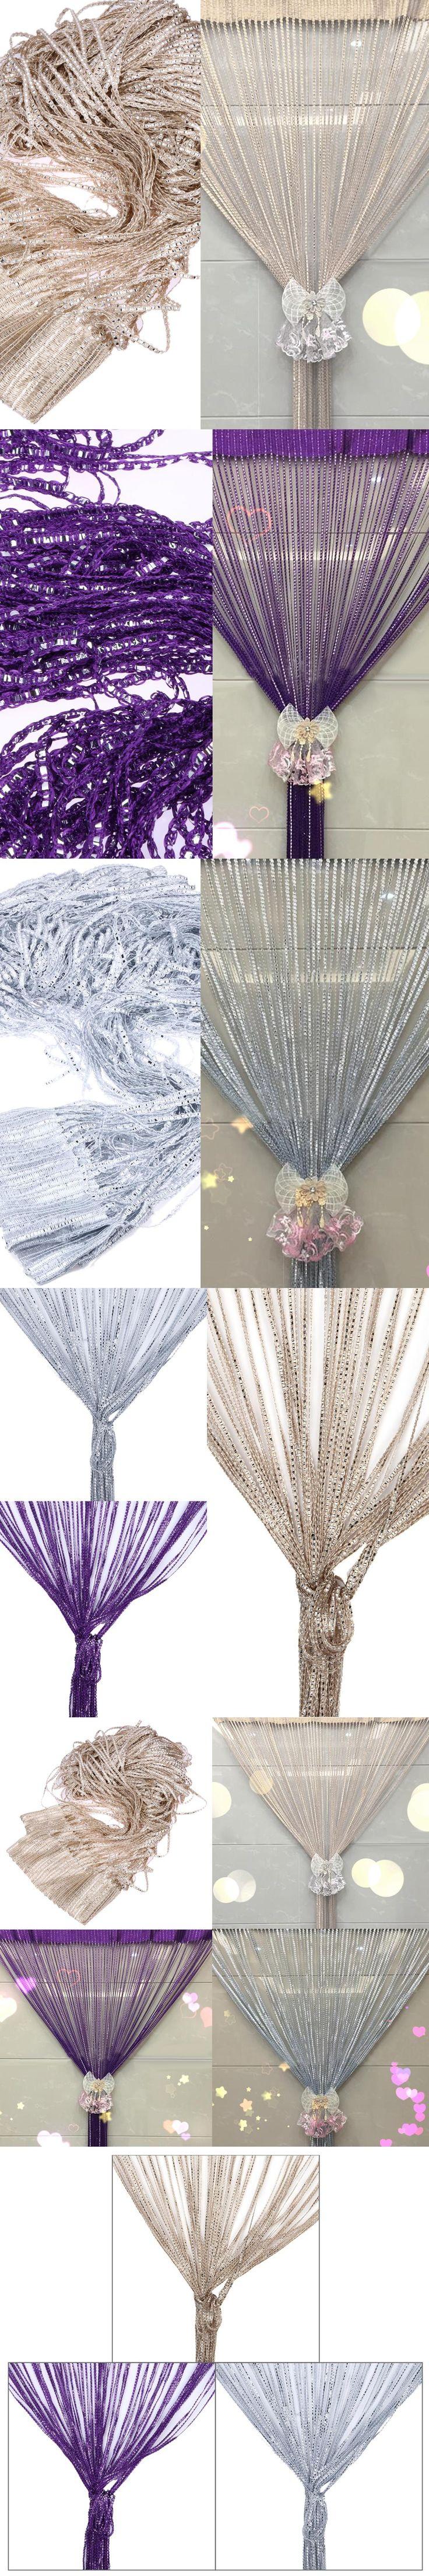 Shiny Crystal Bead String Curtain Silver Leather Line Tessel Curtain Window Door Divider Sheer Curtain Valance Wedding HomeDecor